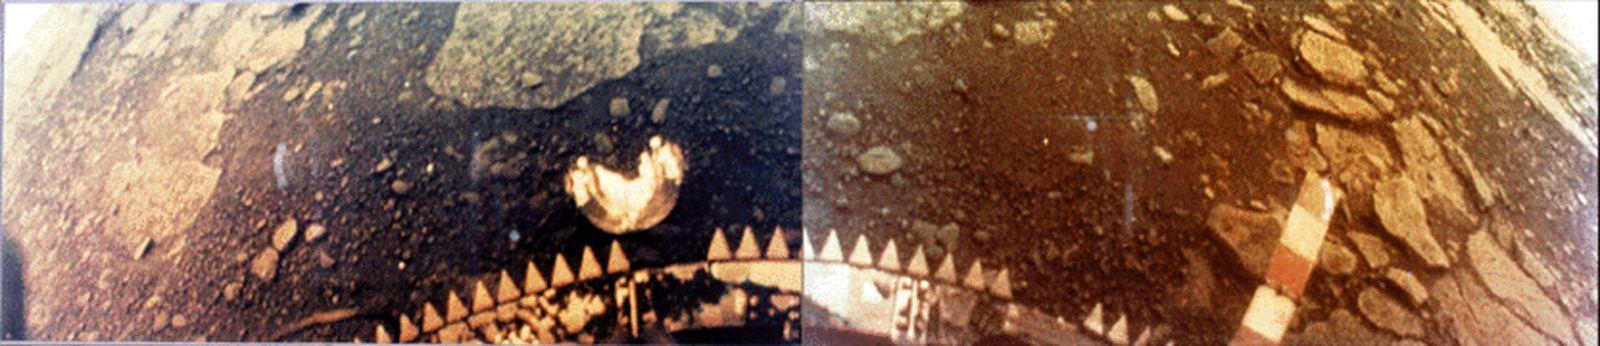 Venera 13 Venus landing image